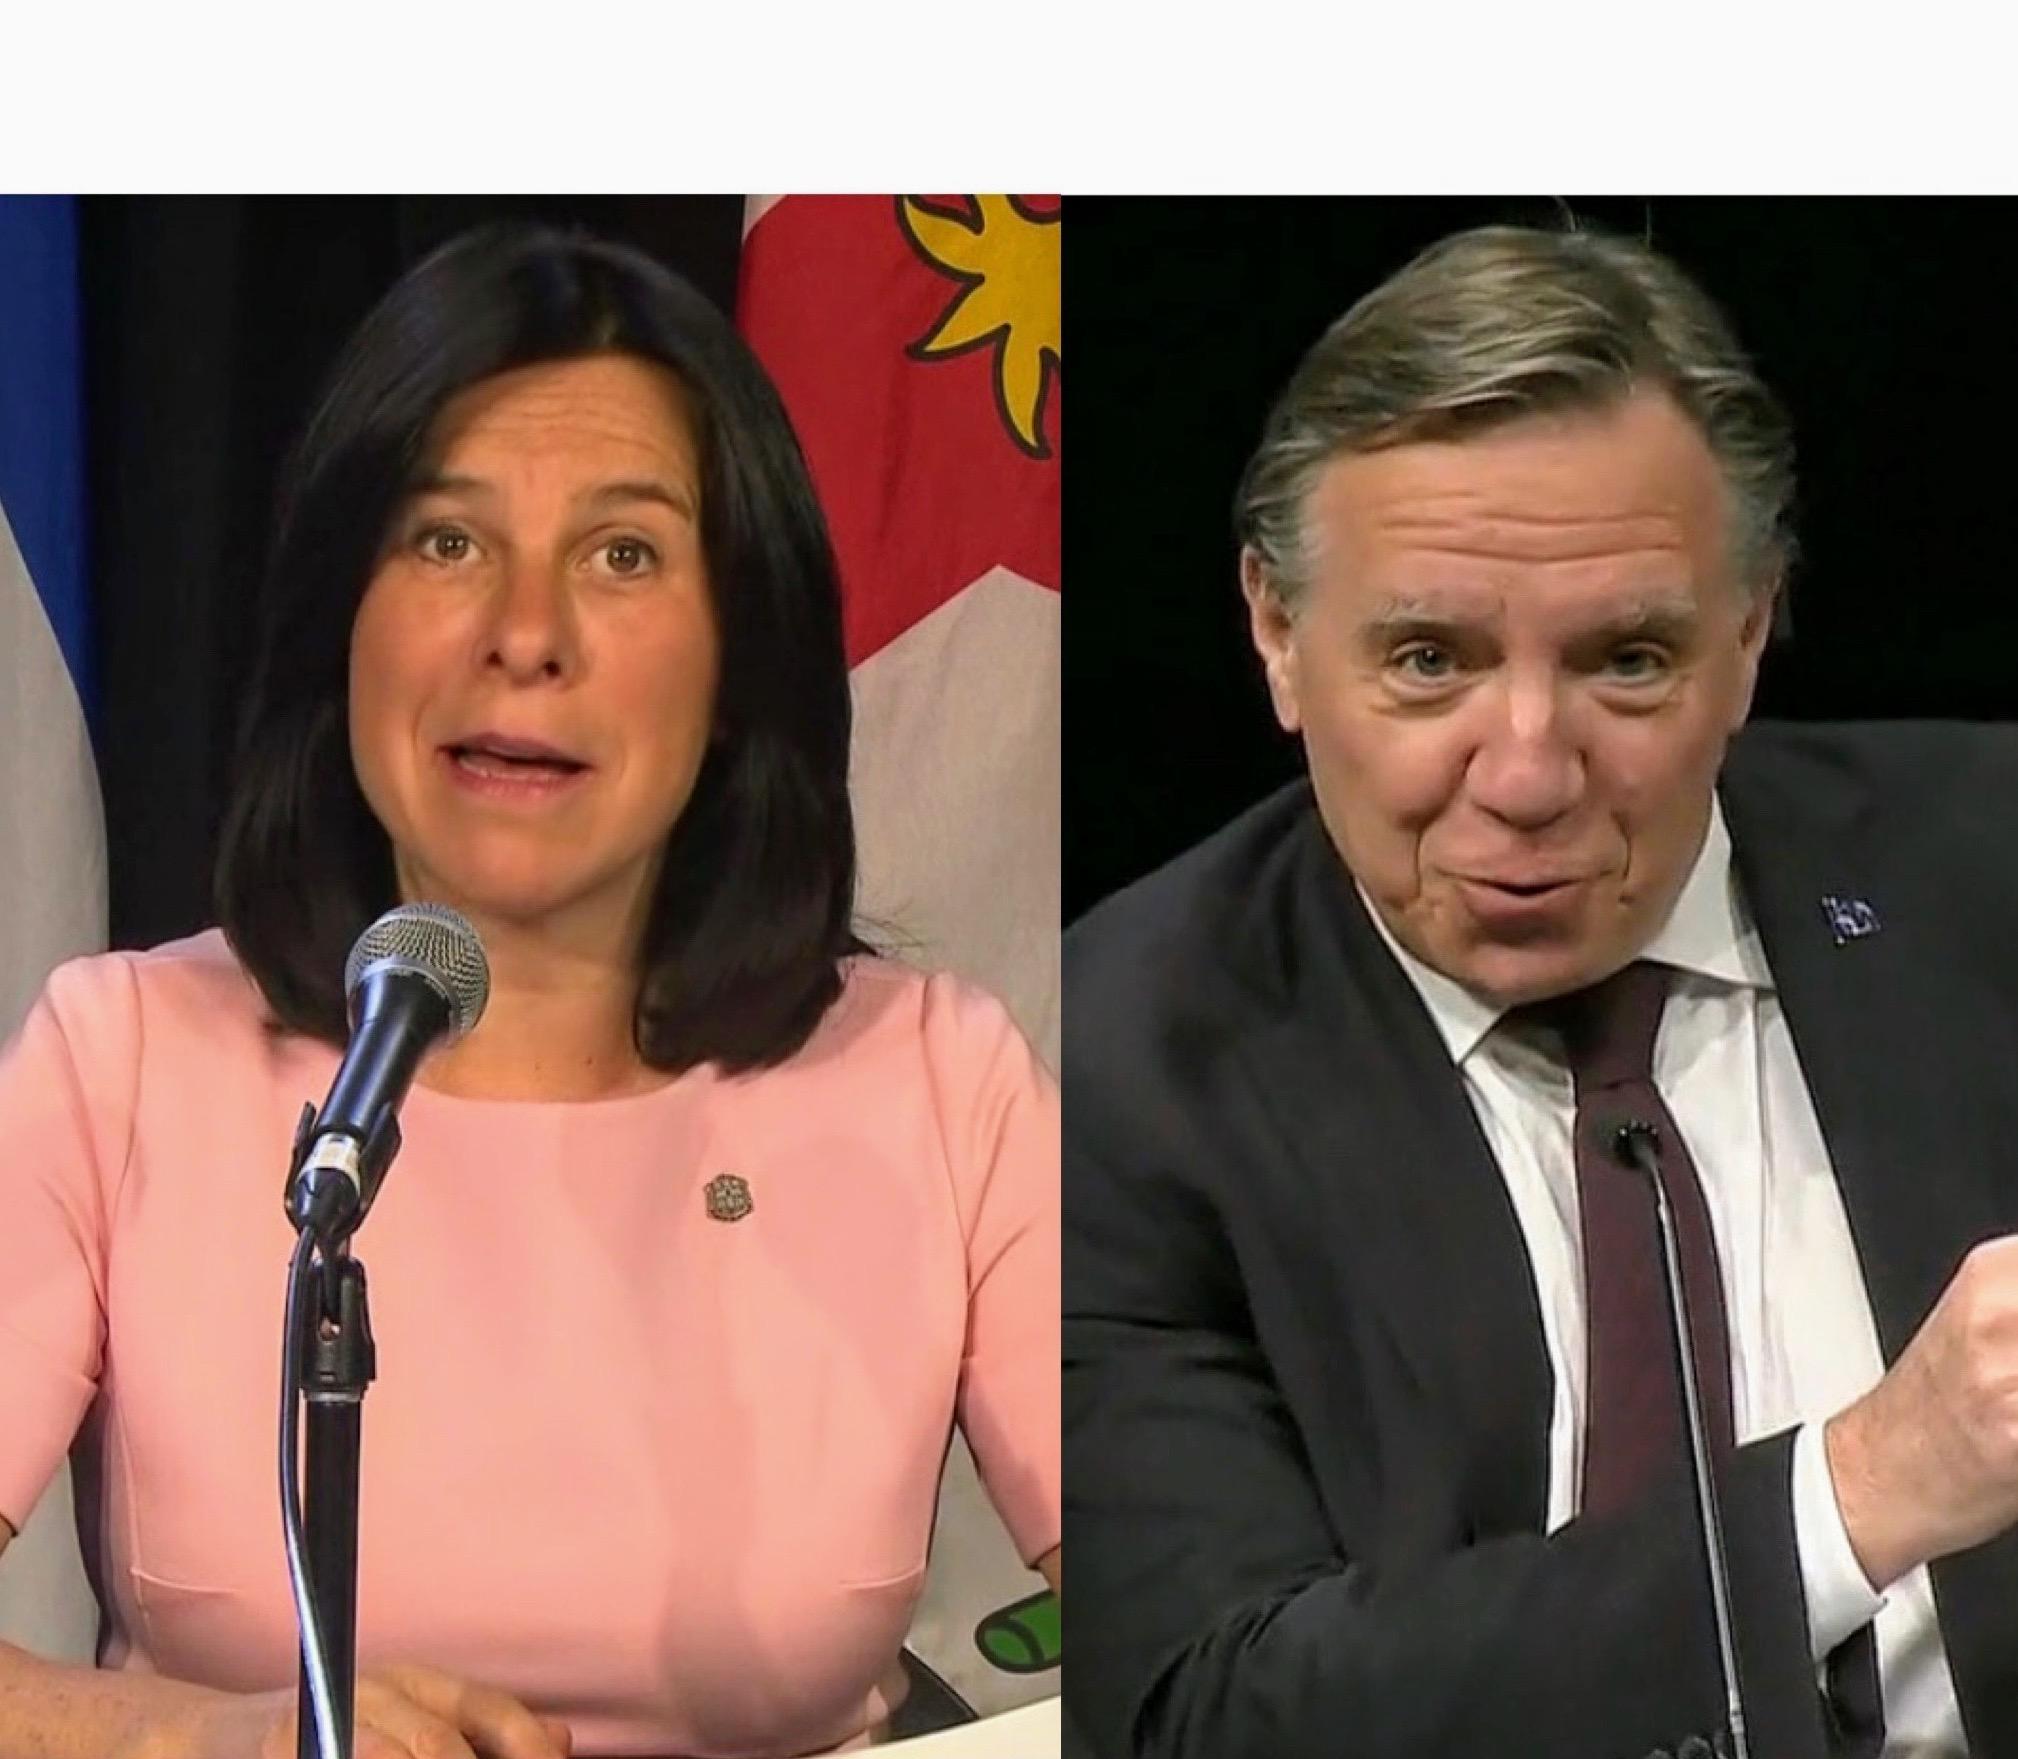 Valérie Plante and François Legault anti-racism Montreal